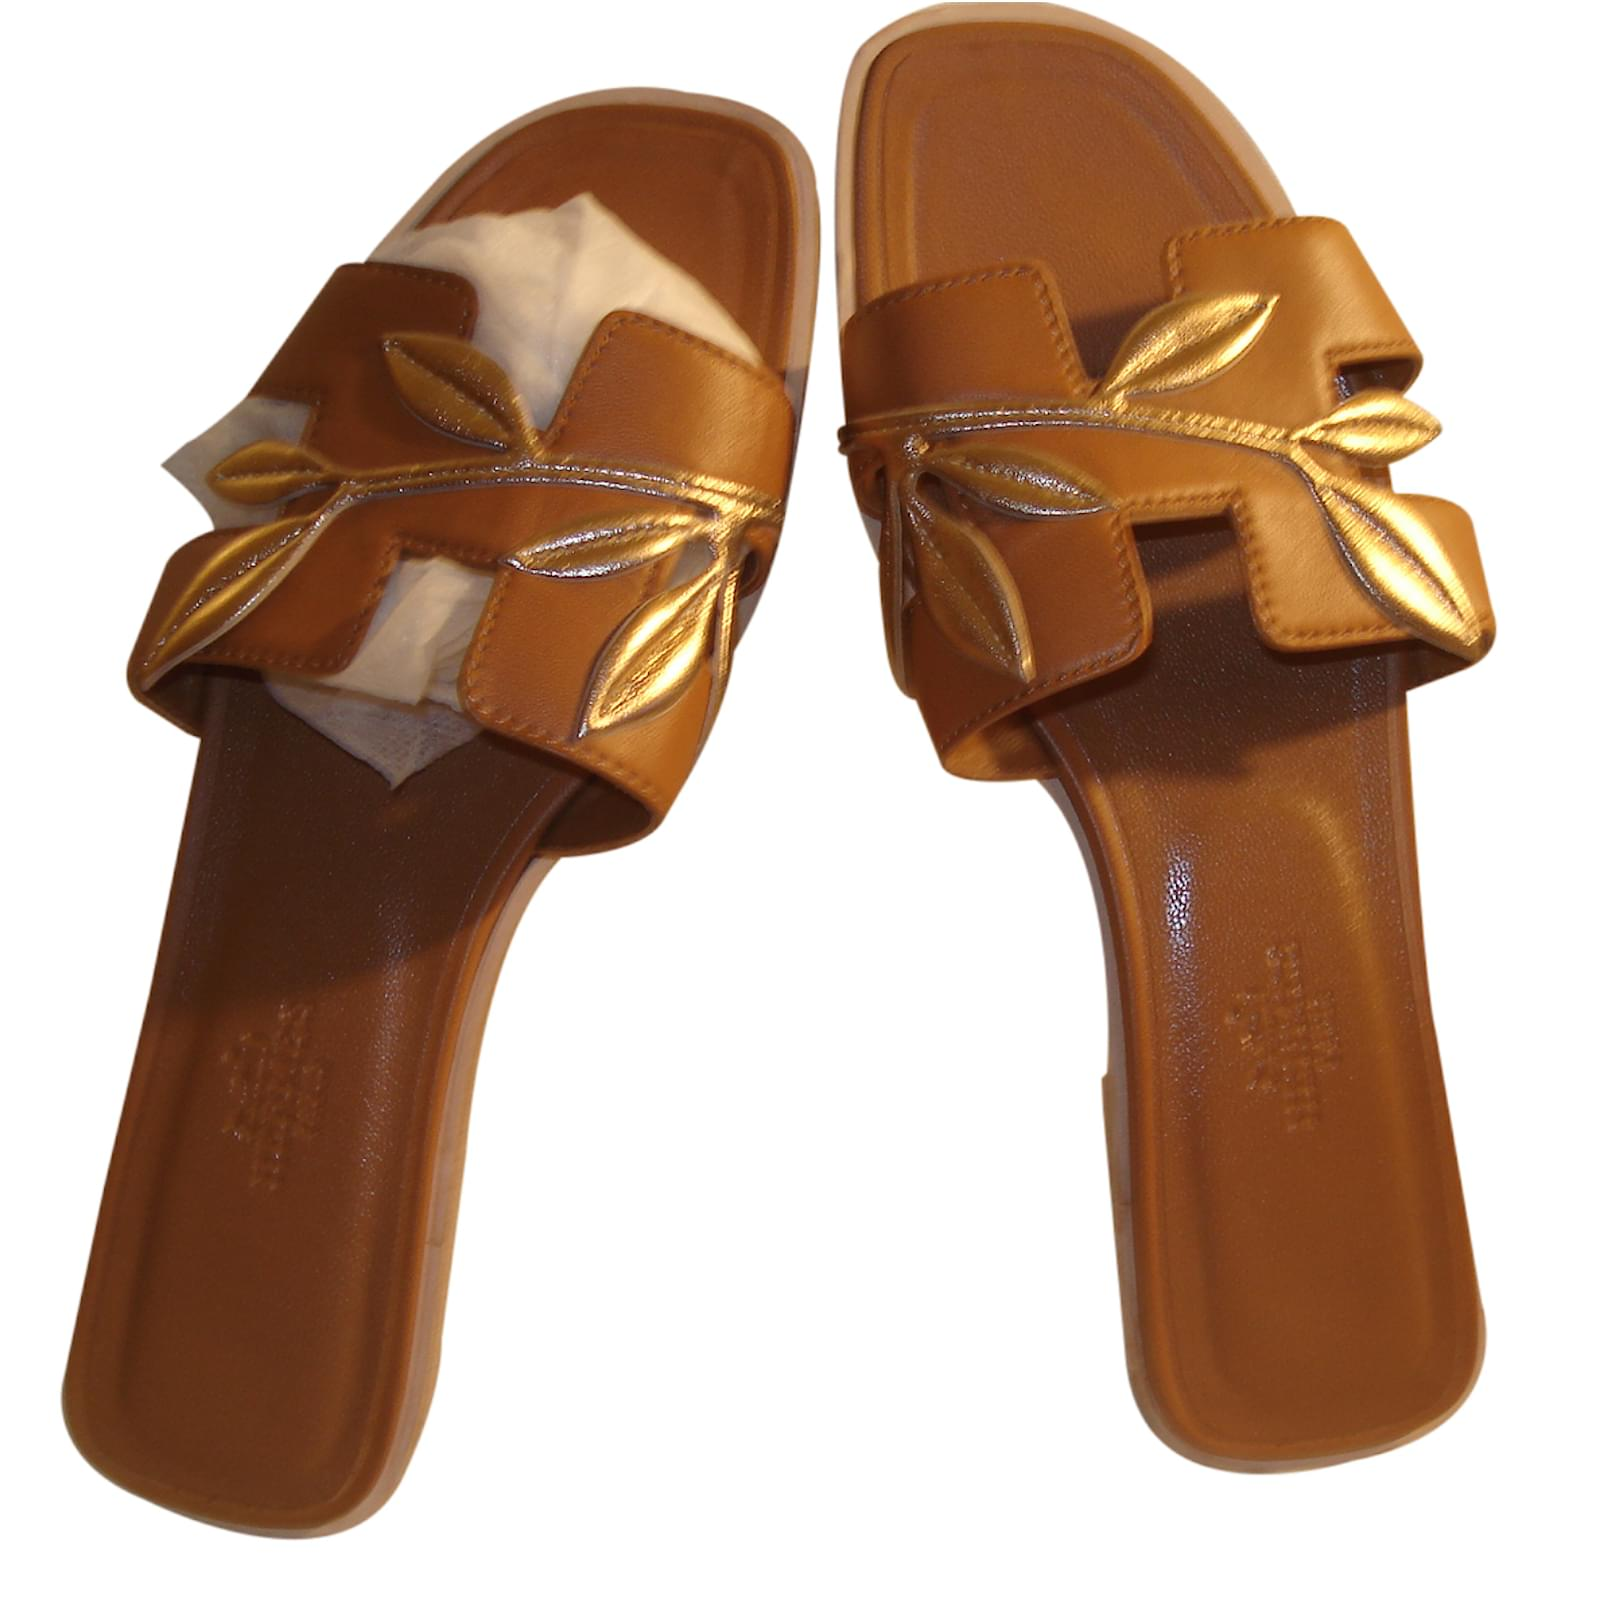 e21e8778edde Sandales Hermès Oran Cuir Marron ref.22793 - Joli Closet